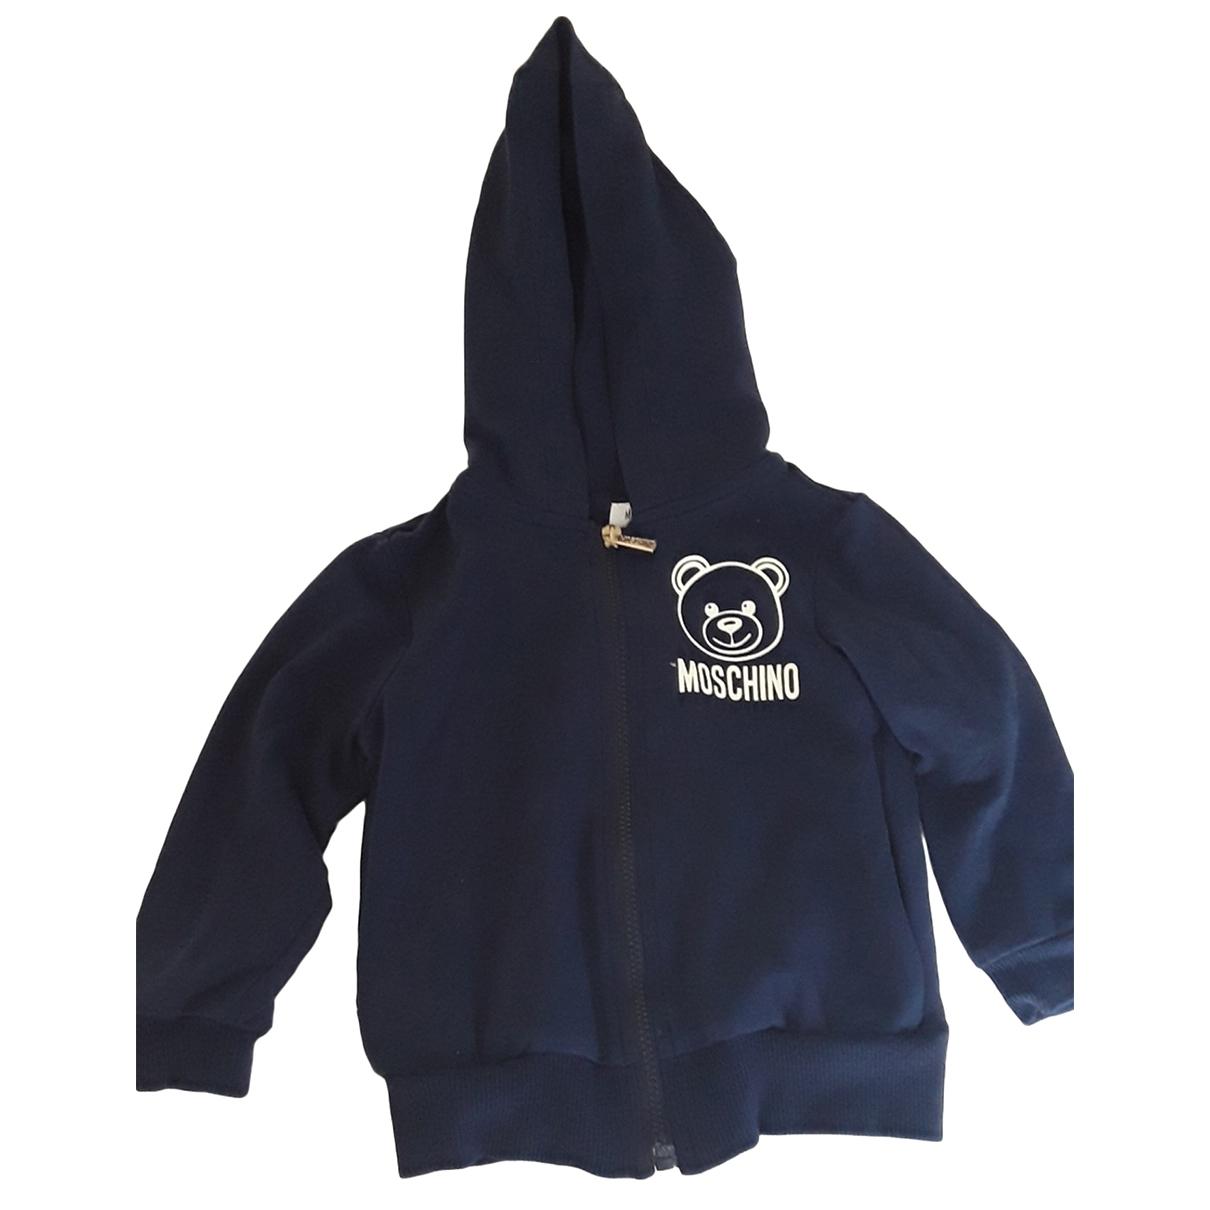 Moschino - Pull   pour enfant en coton - bleu